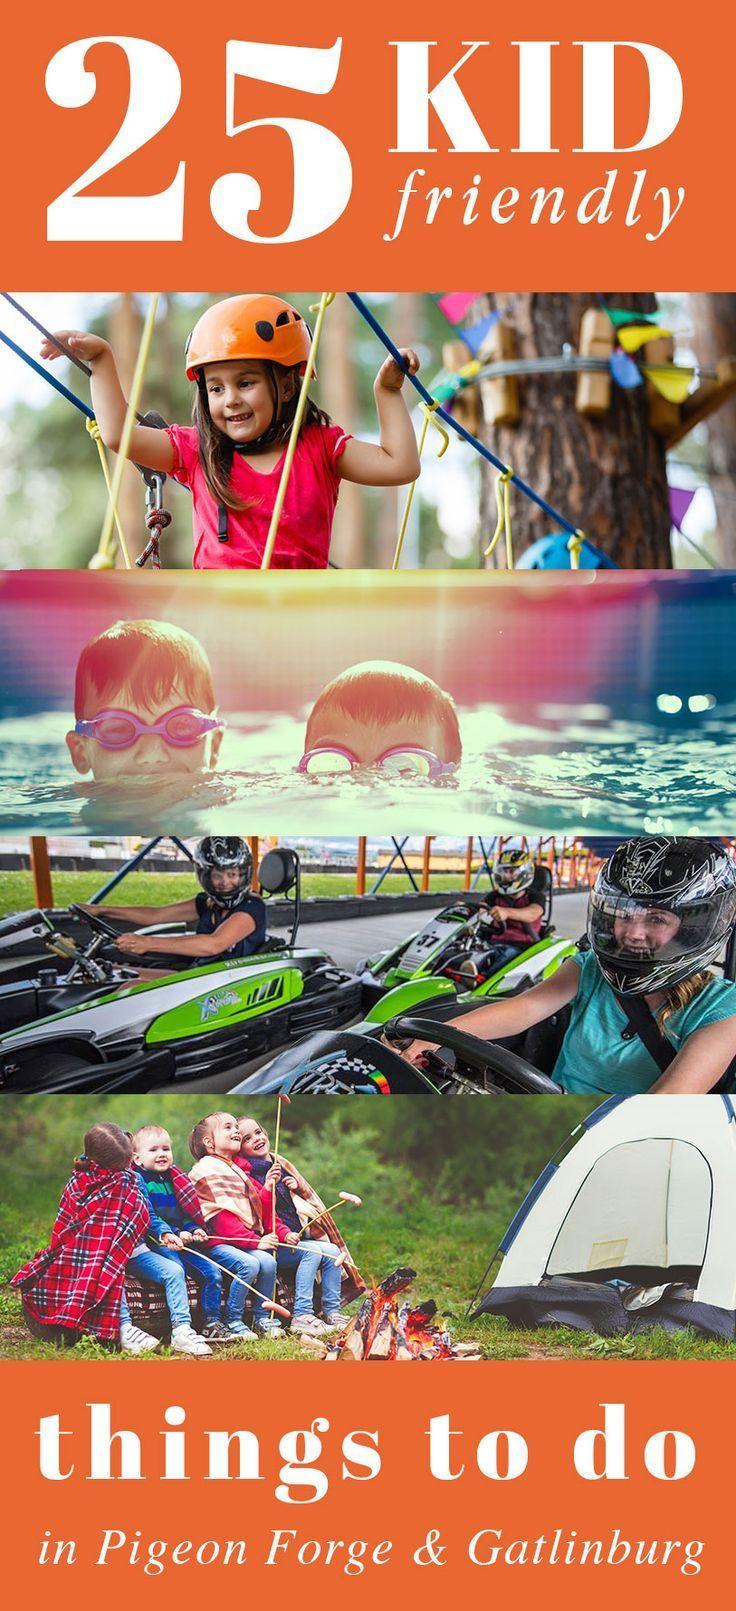 25 kid friendly things to do in pigeon gatlinburg